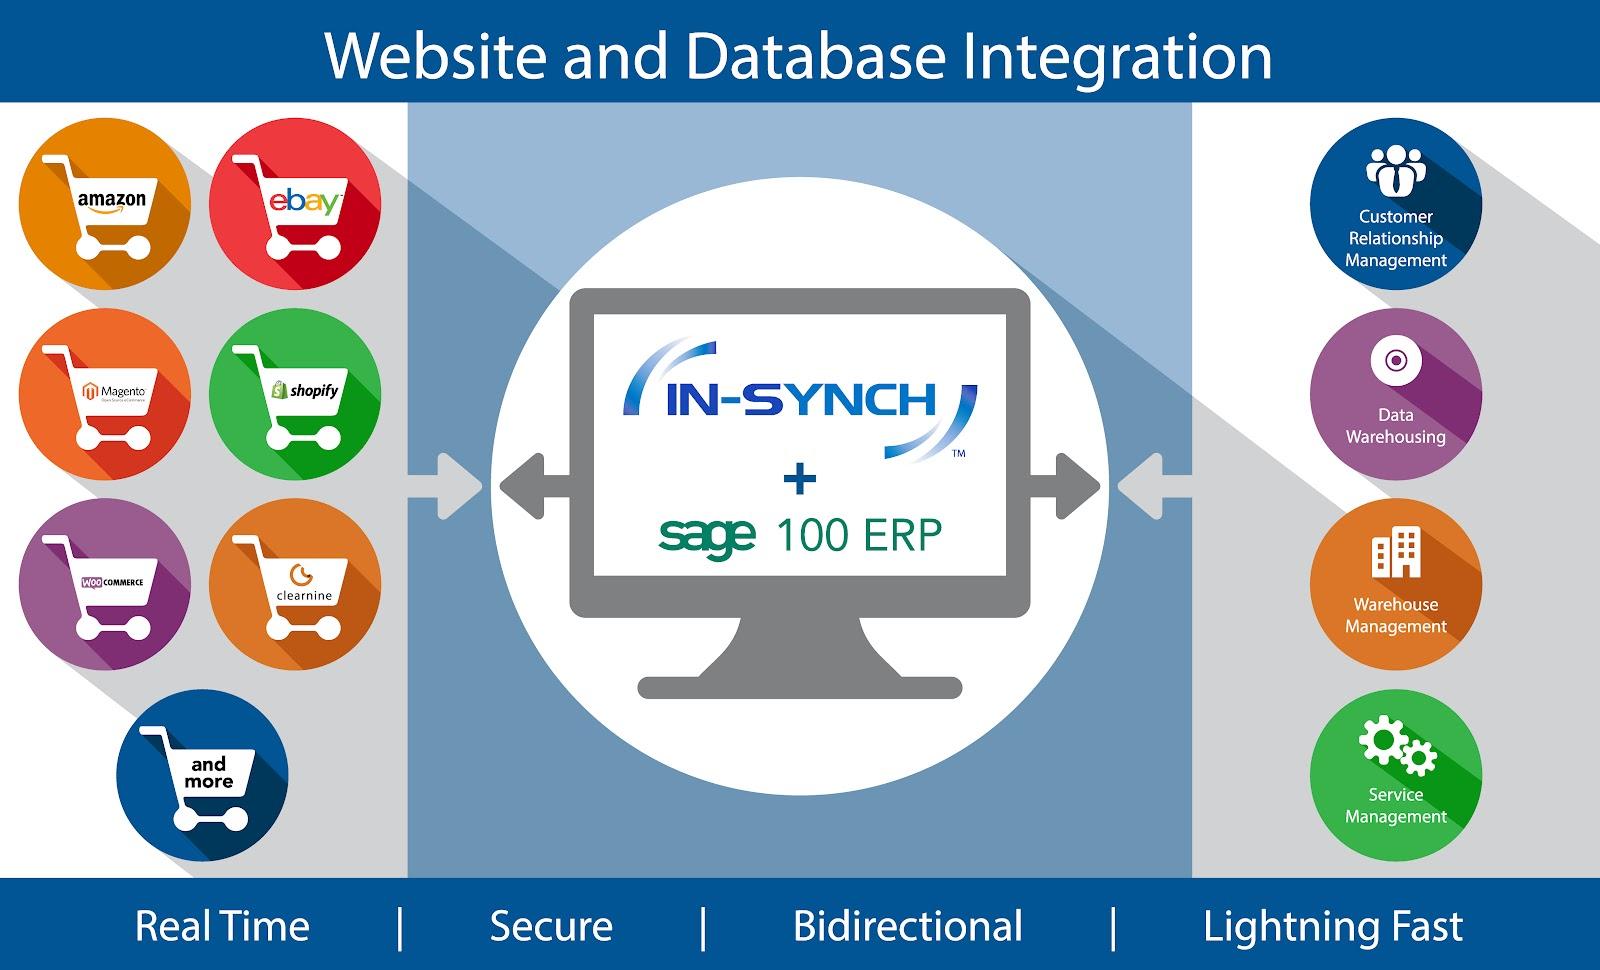 In-Synch & Sage 100 ERP